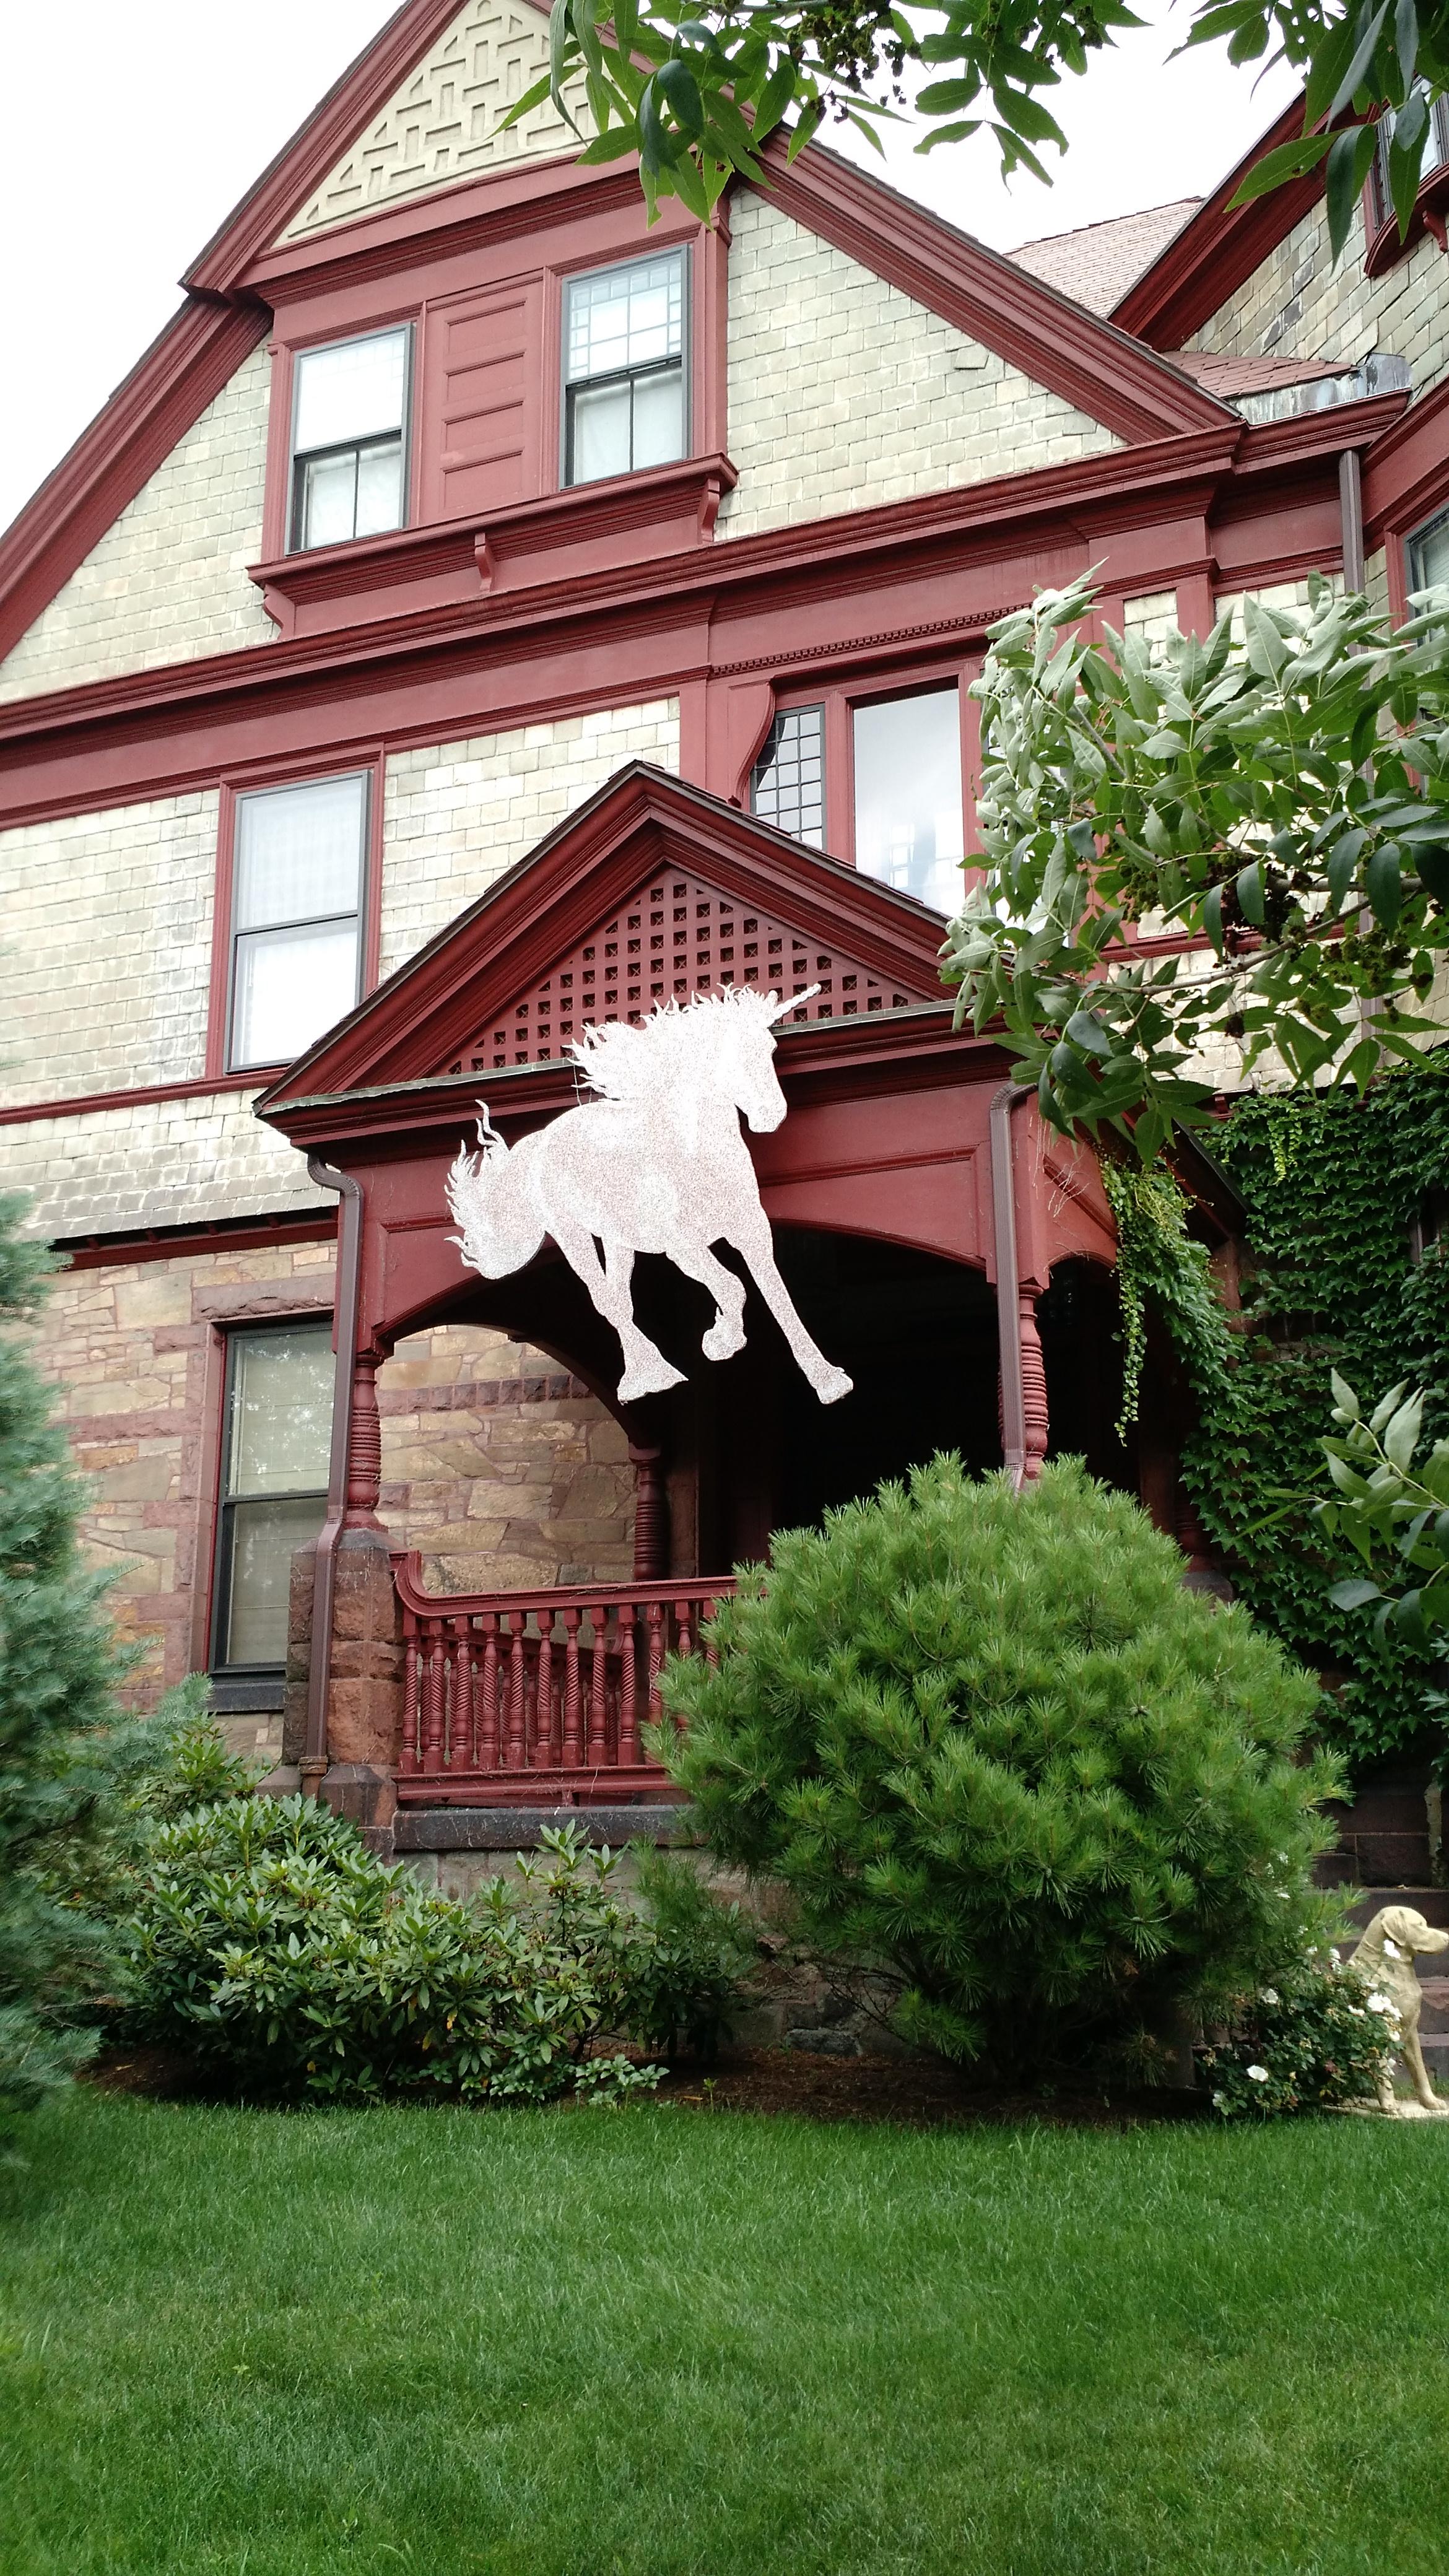 Unicorns In Residence, 2015